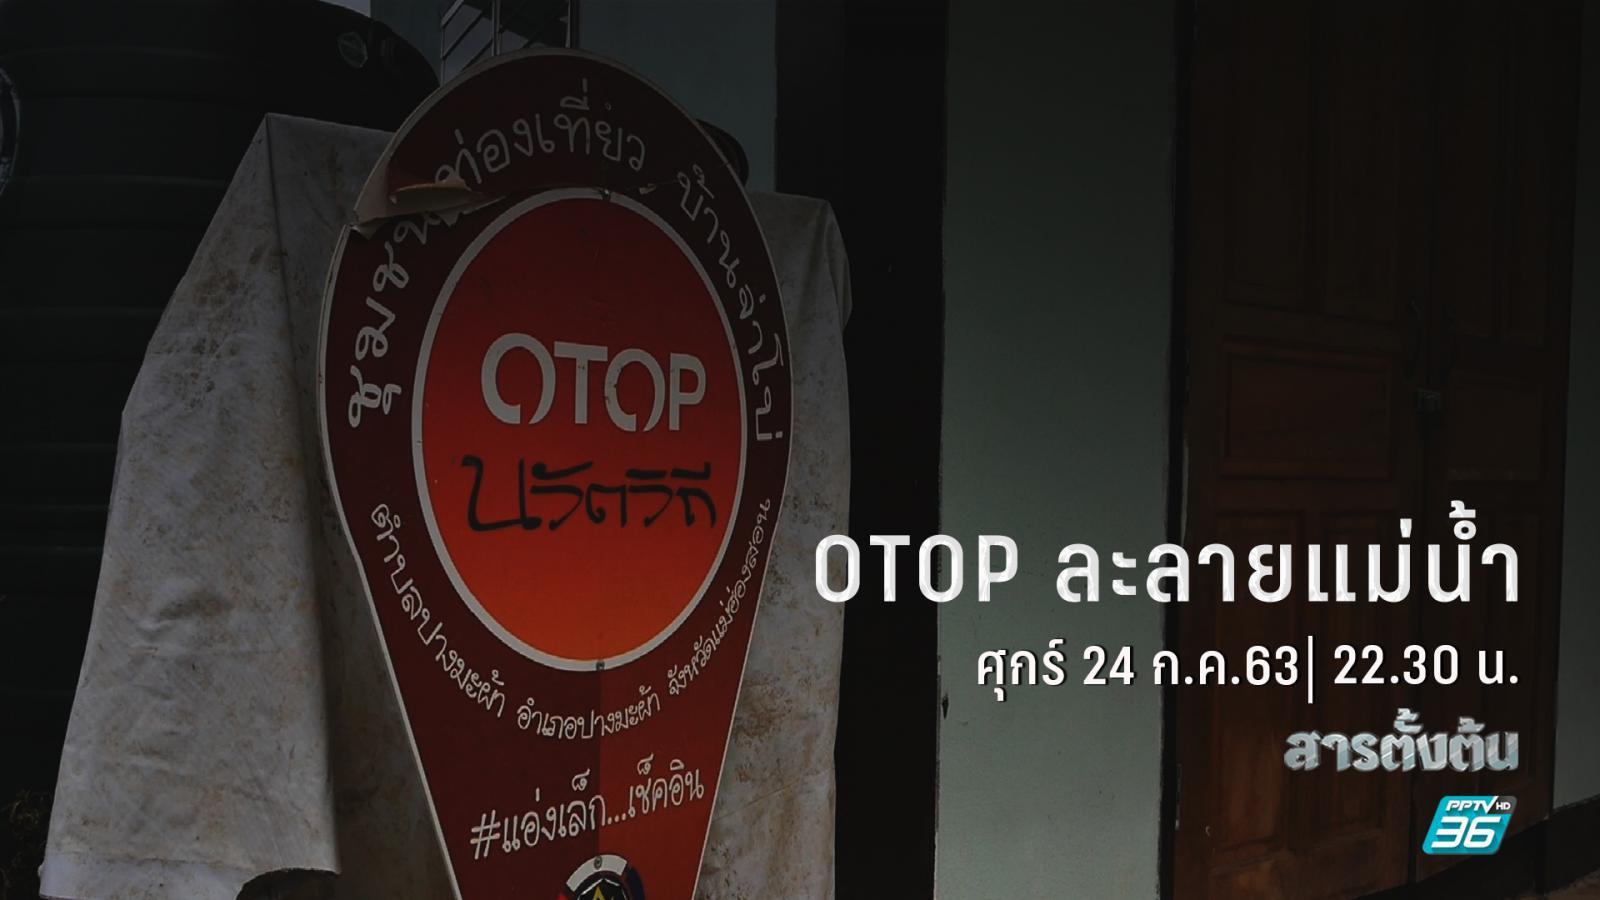 OTOP ละลายแม่น้ำ